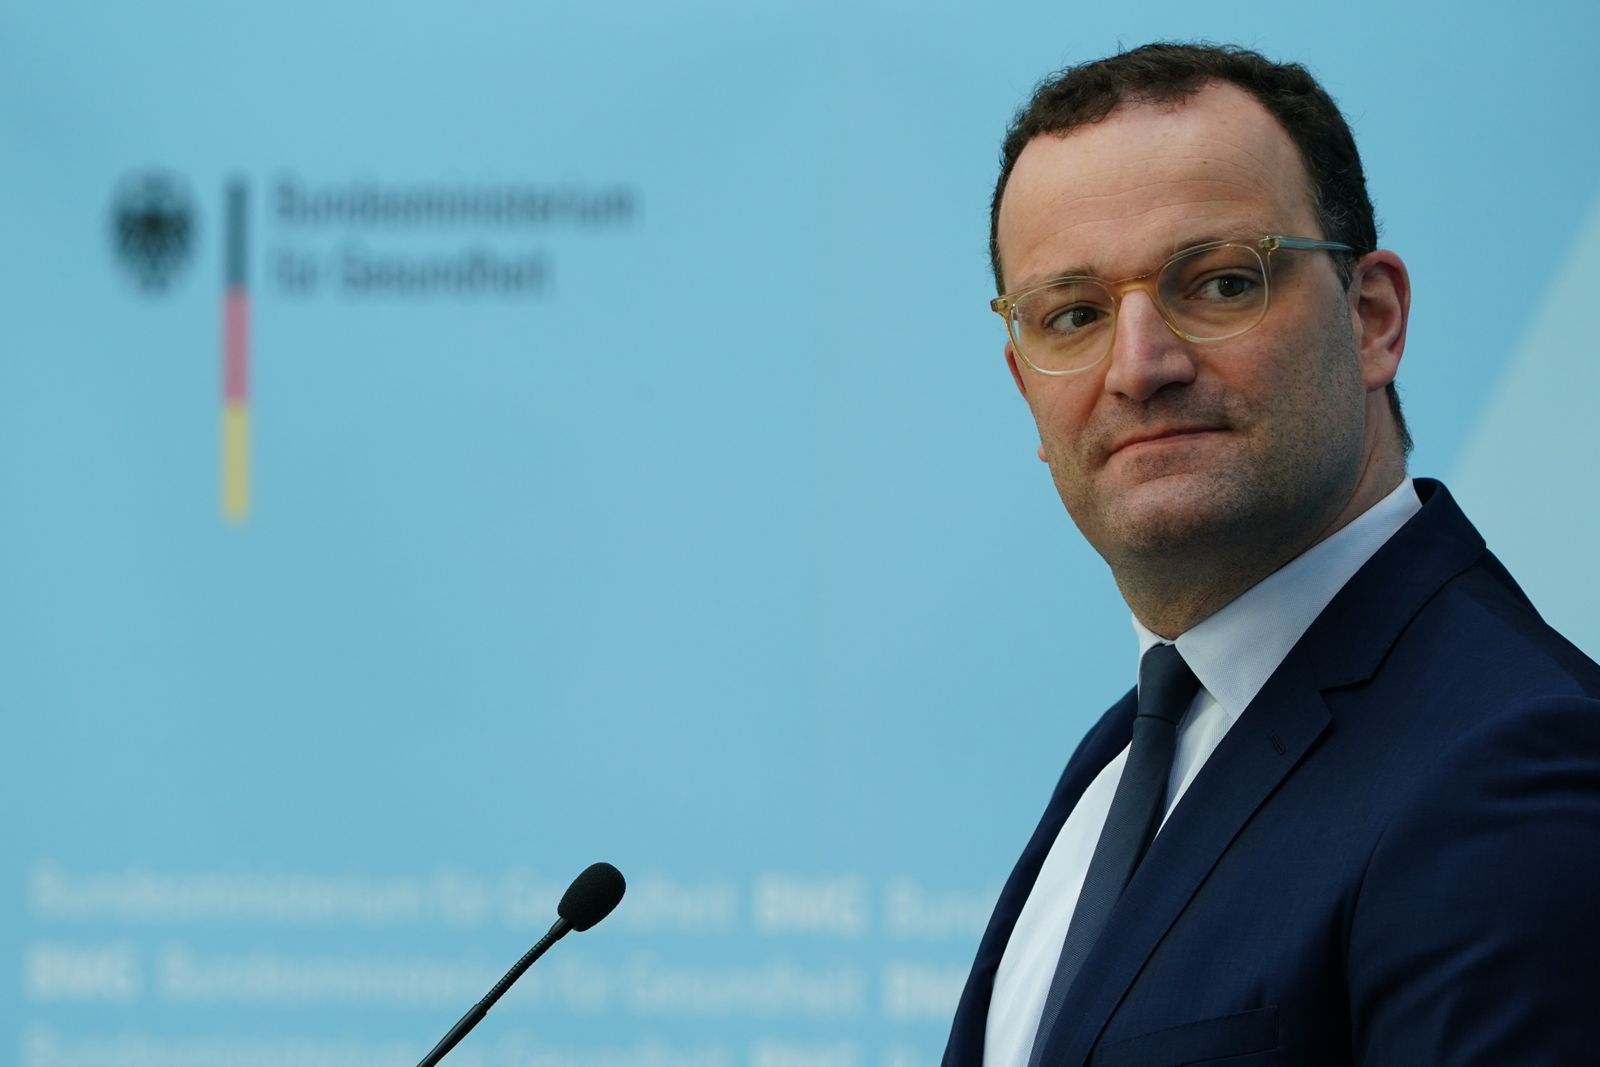 Press statement of German Health Minister Jens Spahn